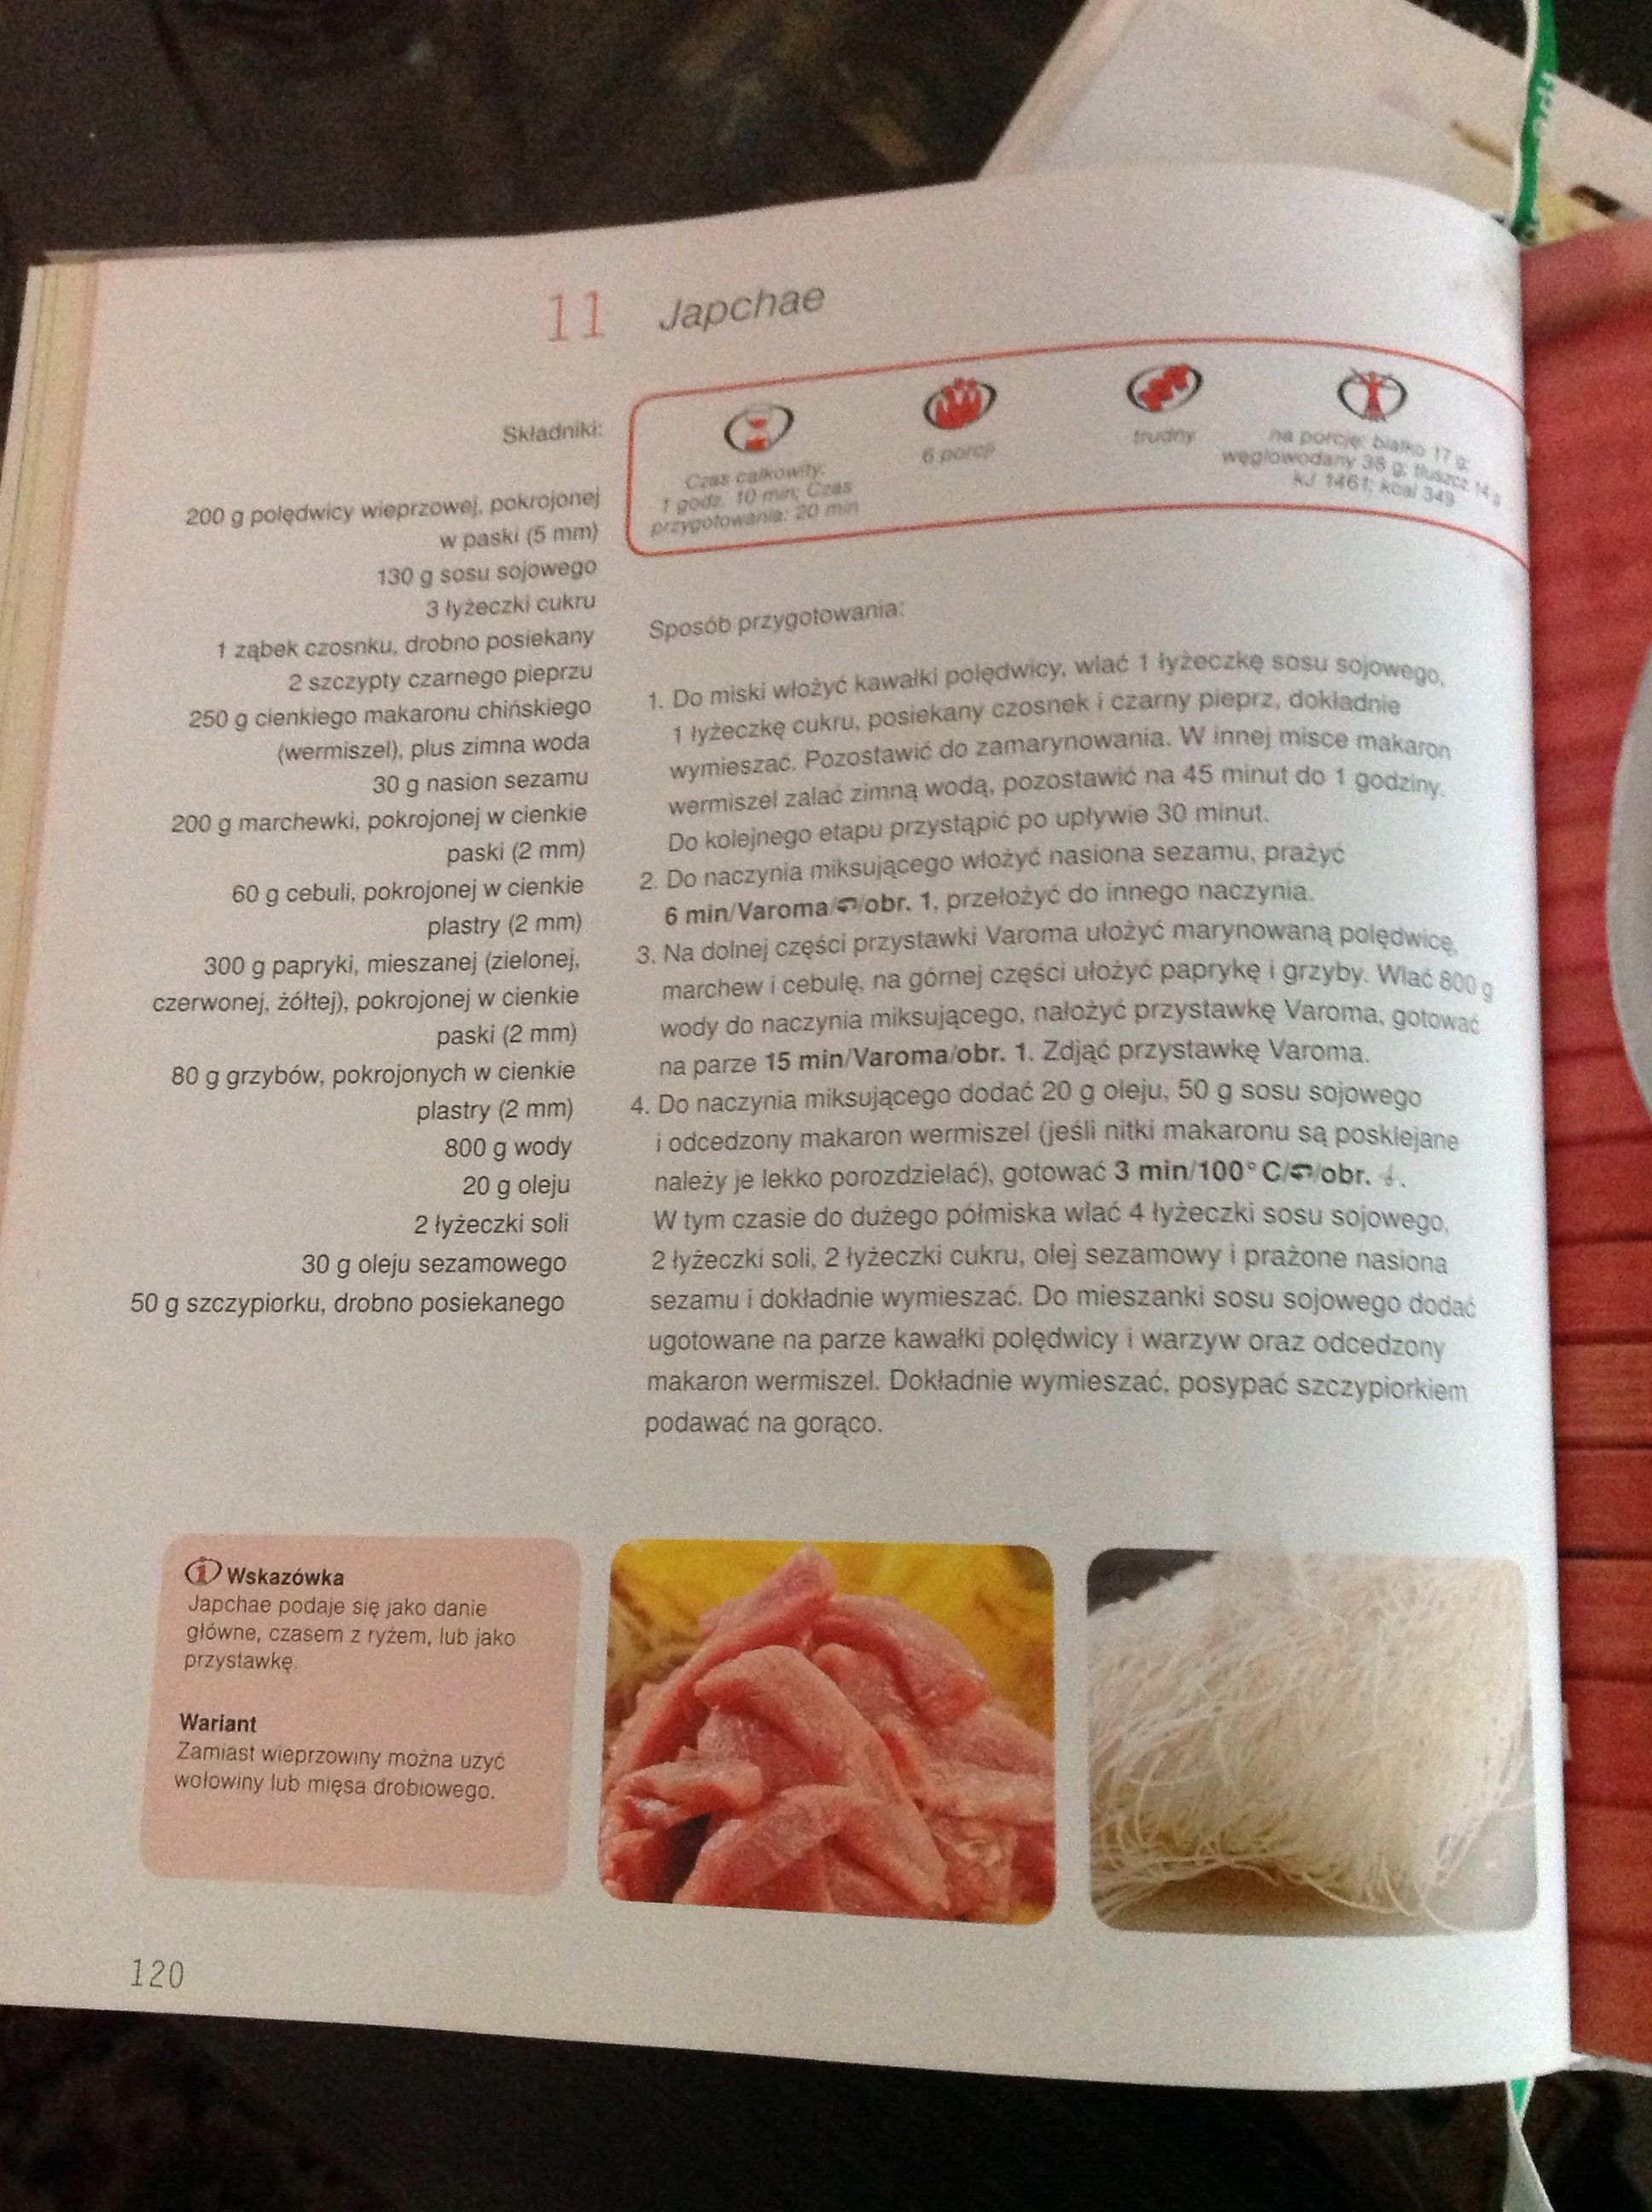 Japchae Thermomix Recipes Japchae Thermomix